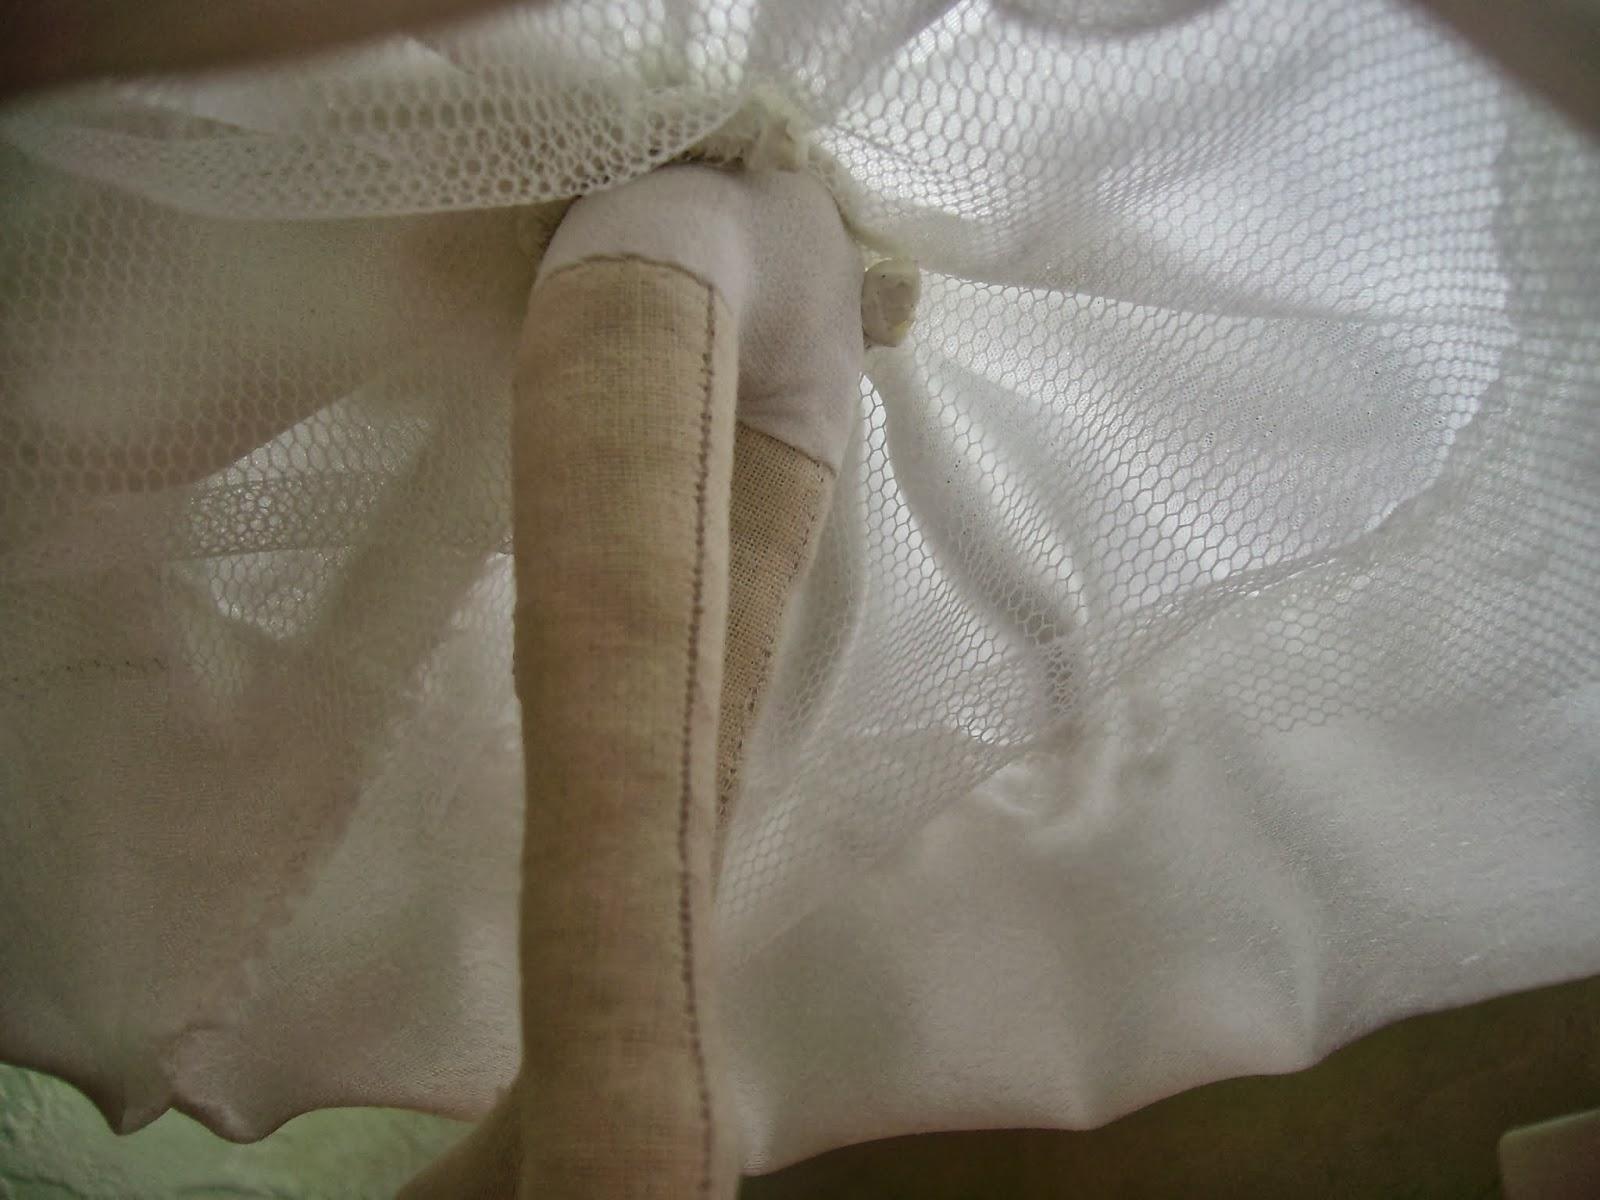 фото под юбкой у балерин